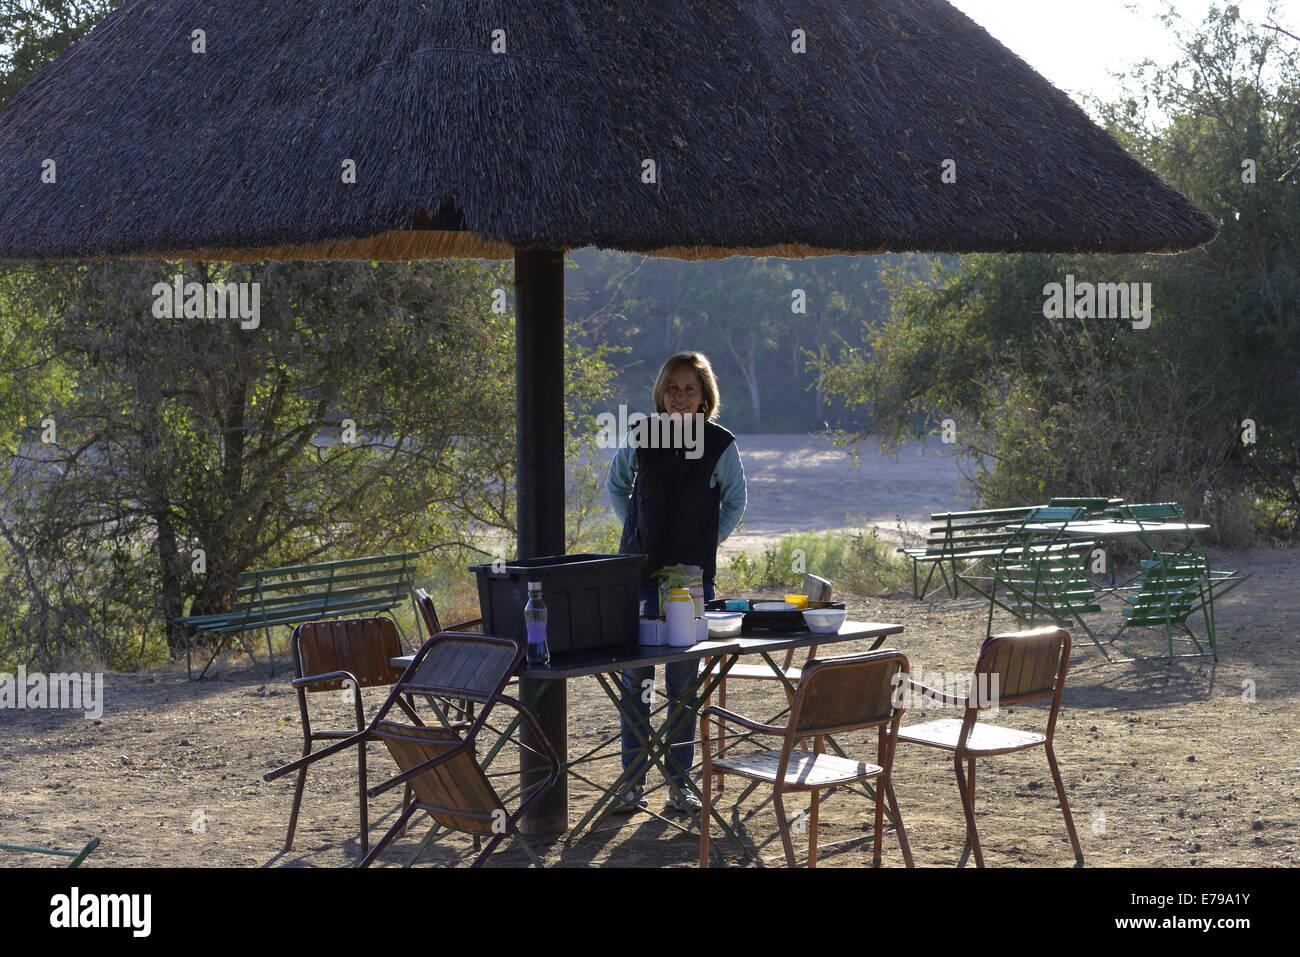 Tourist lady enjoying breakfast at Timbavati picnic spot, Kruger National Park, South Africa. - Stock Image